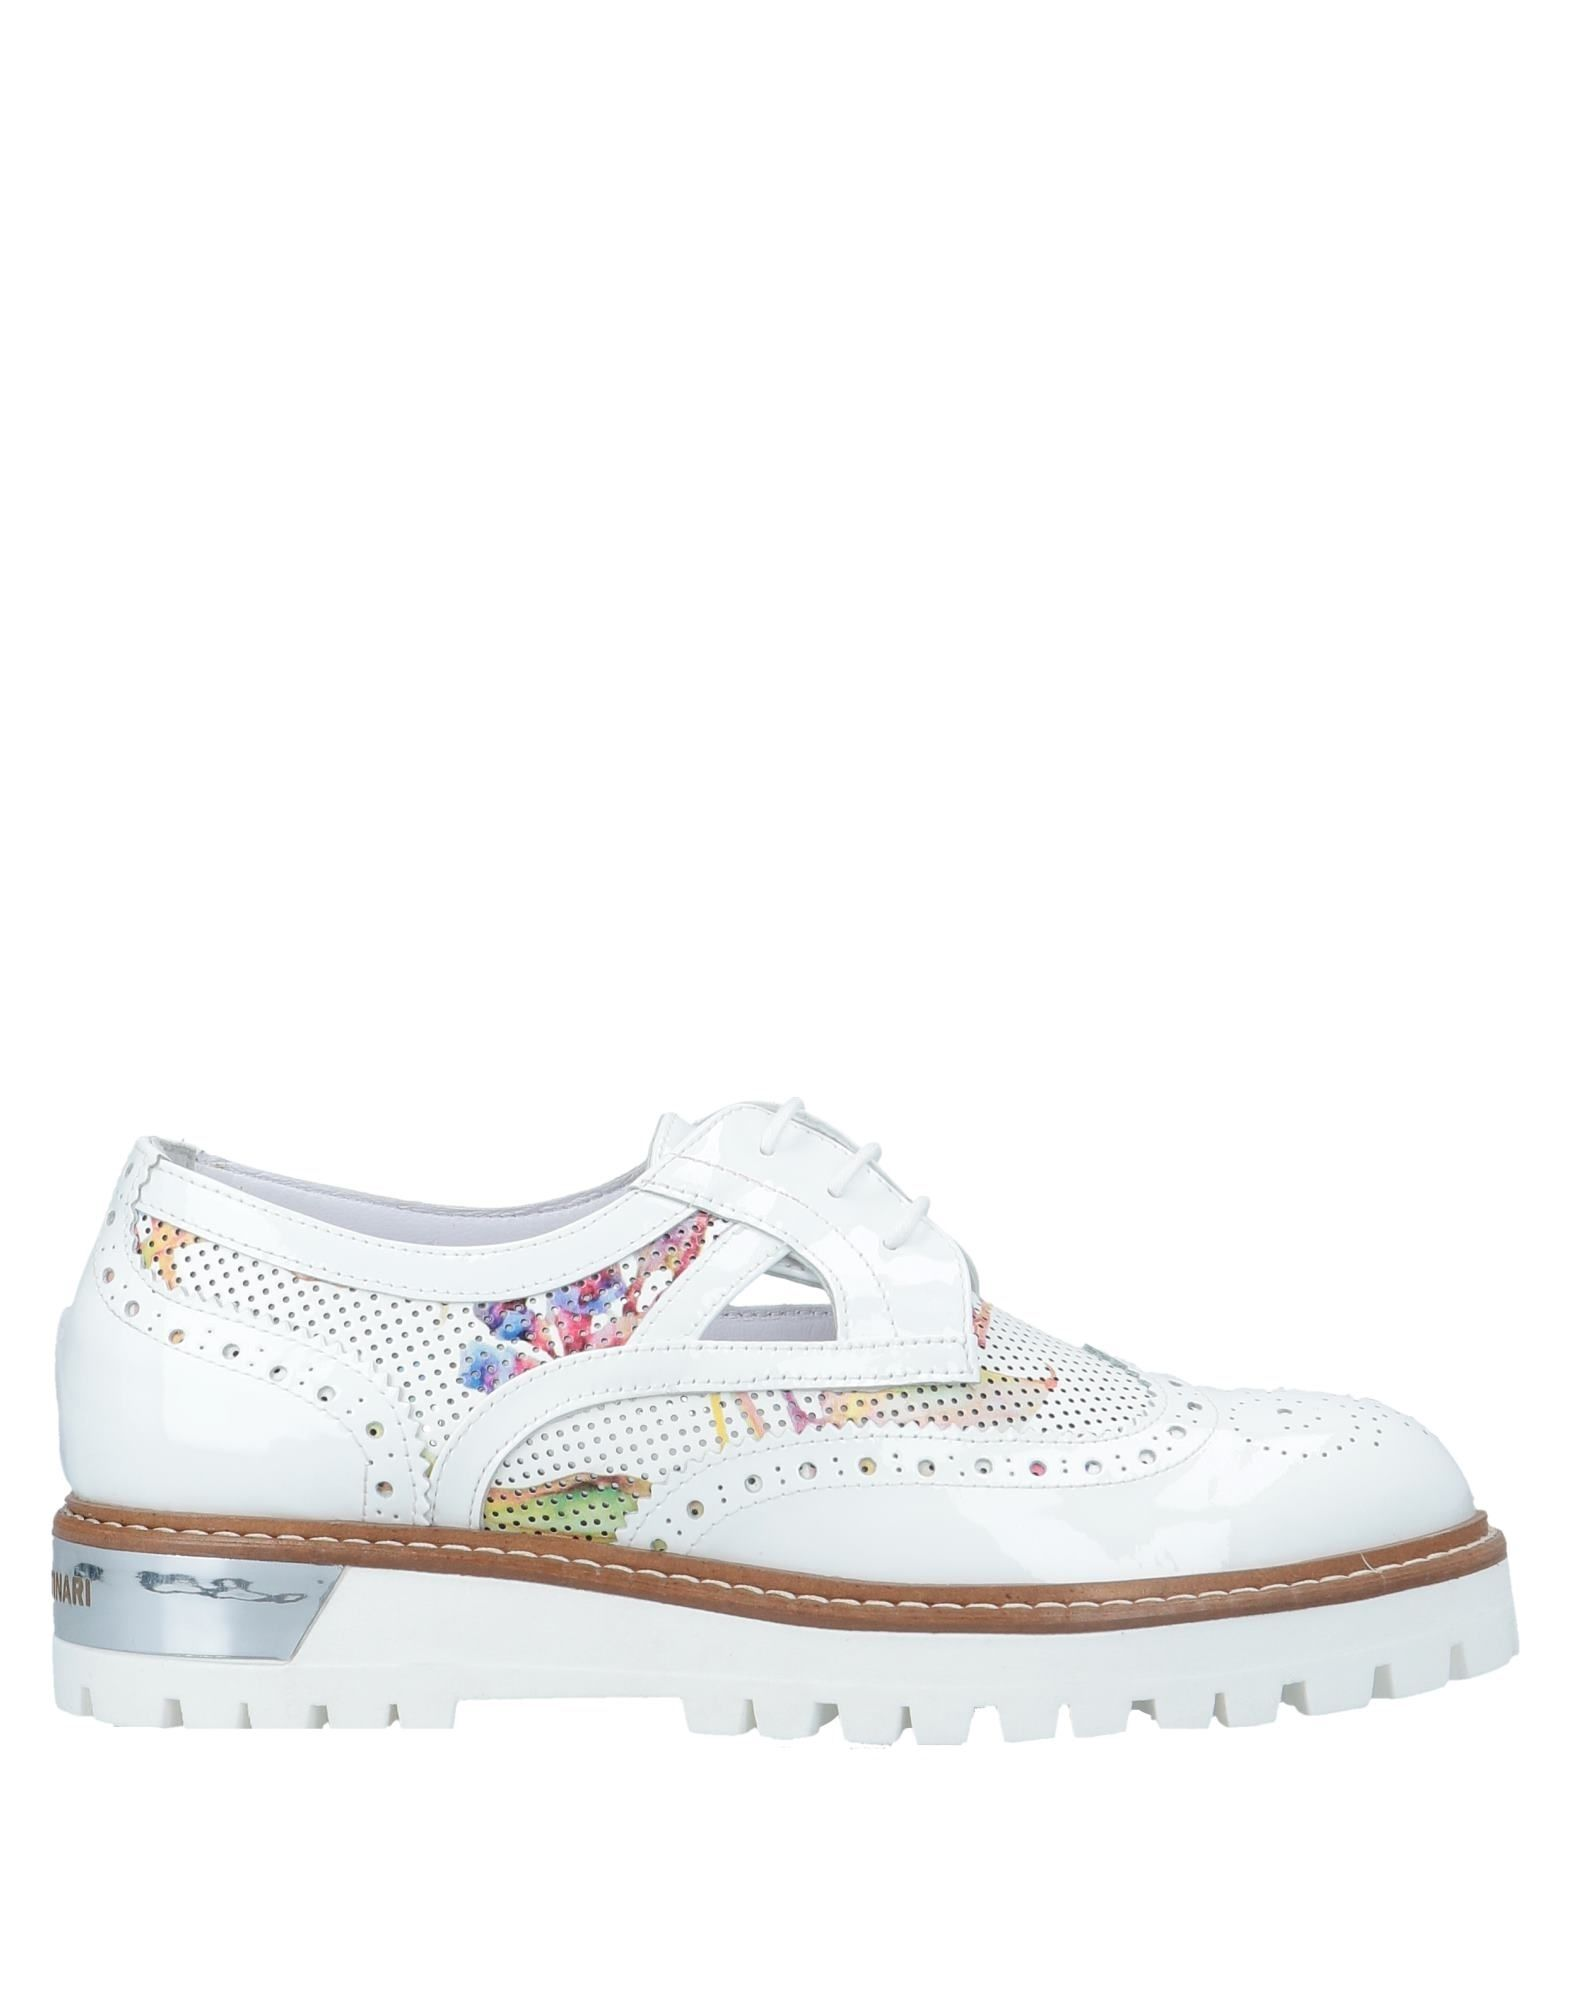 LORETTA PETTINARI Обувь на шнурках loretta by loretta обувь на шнурках